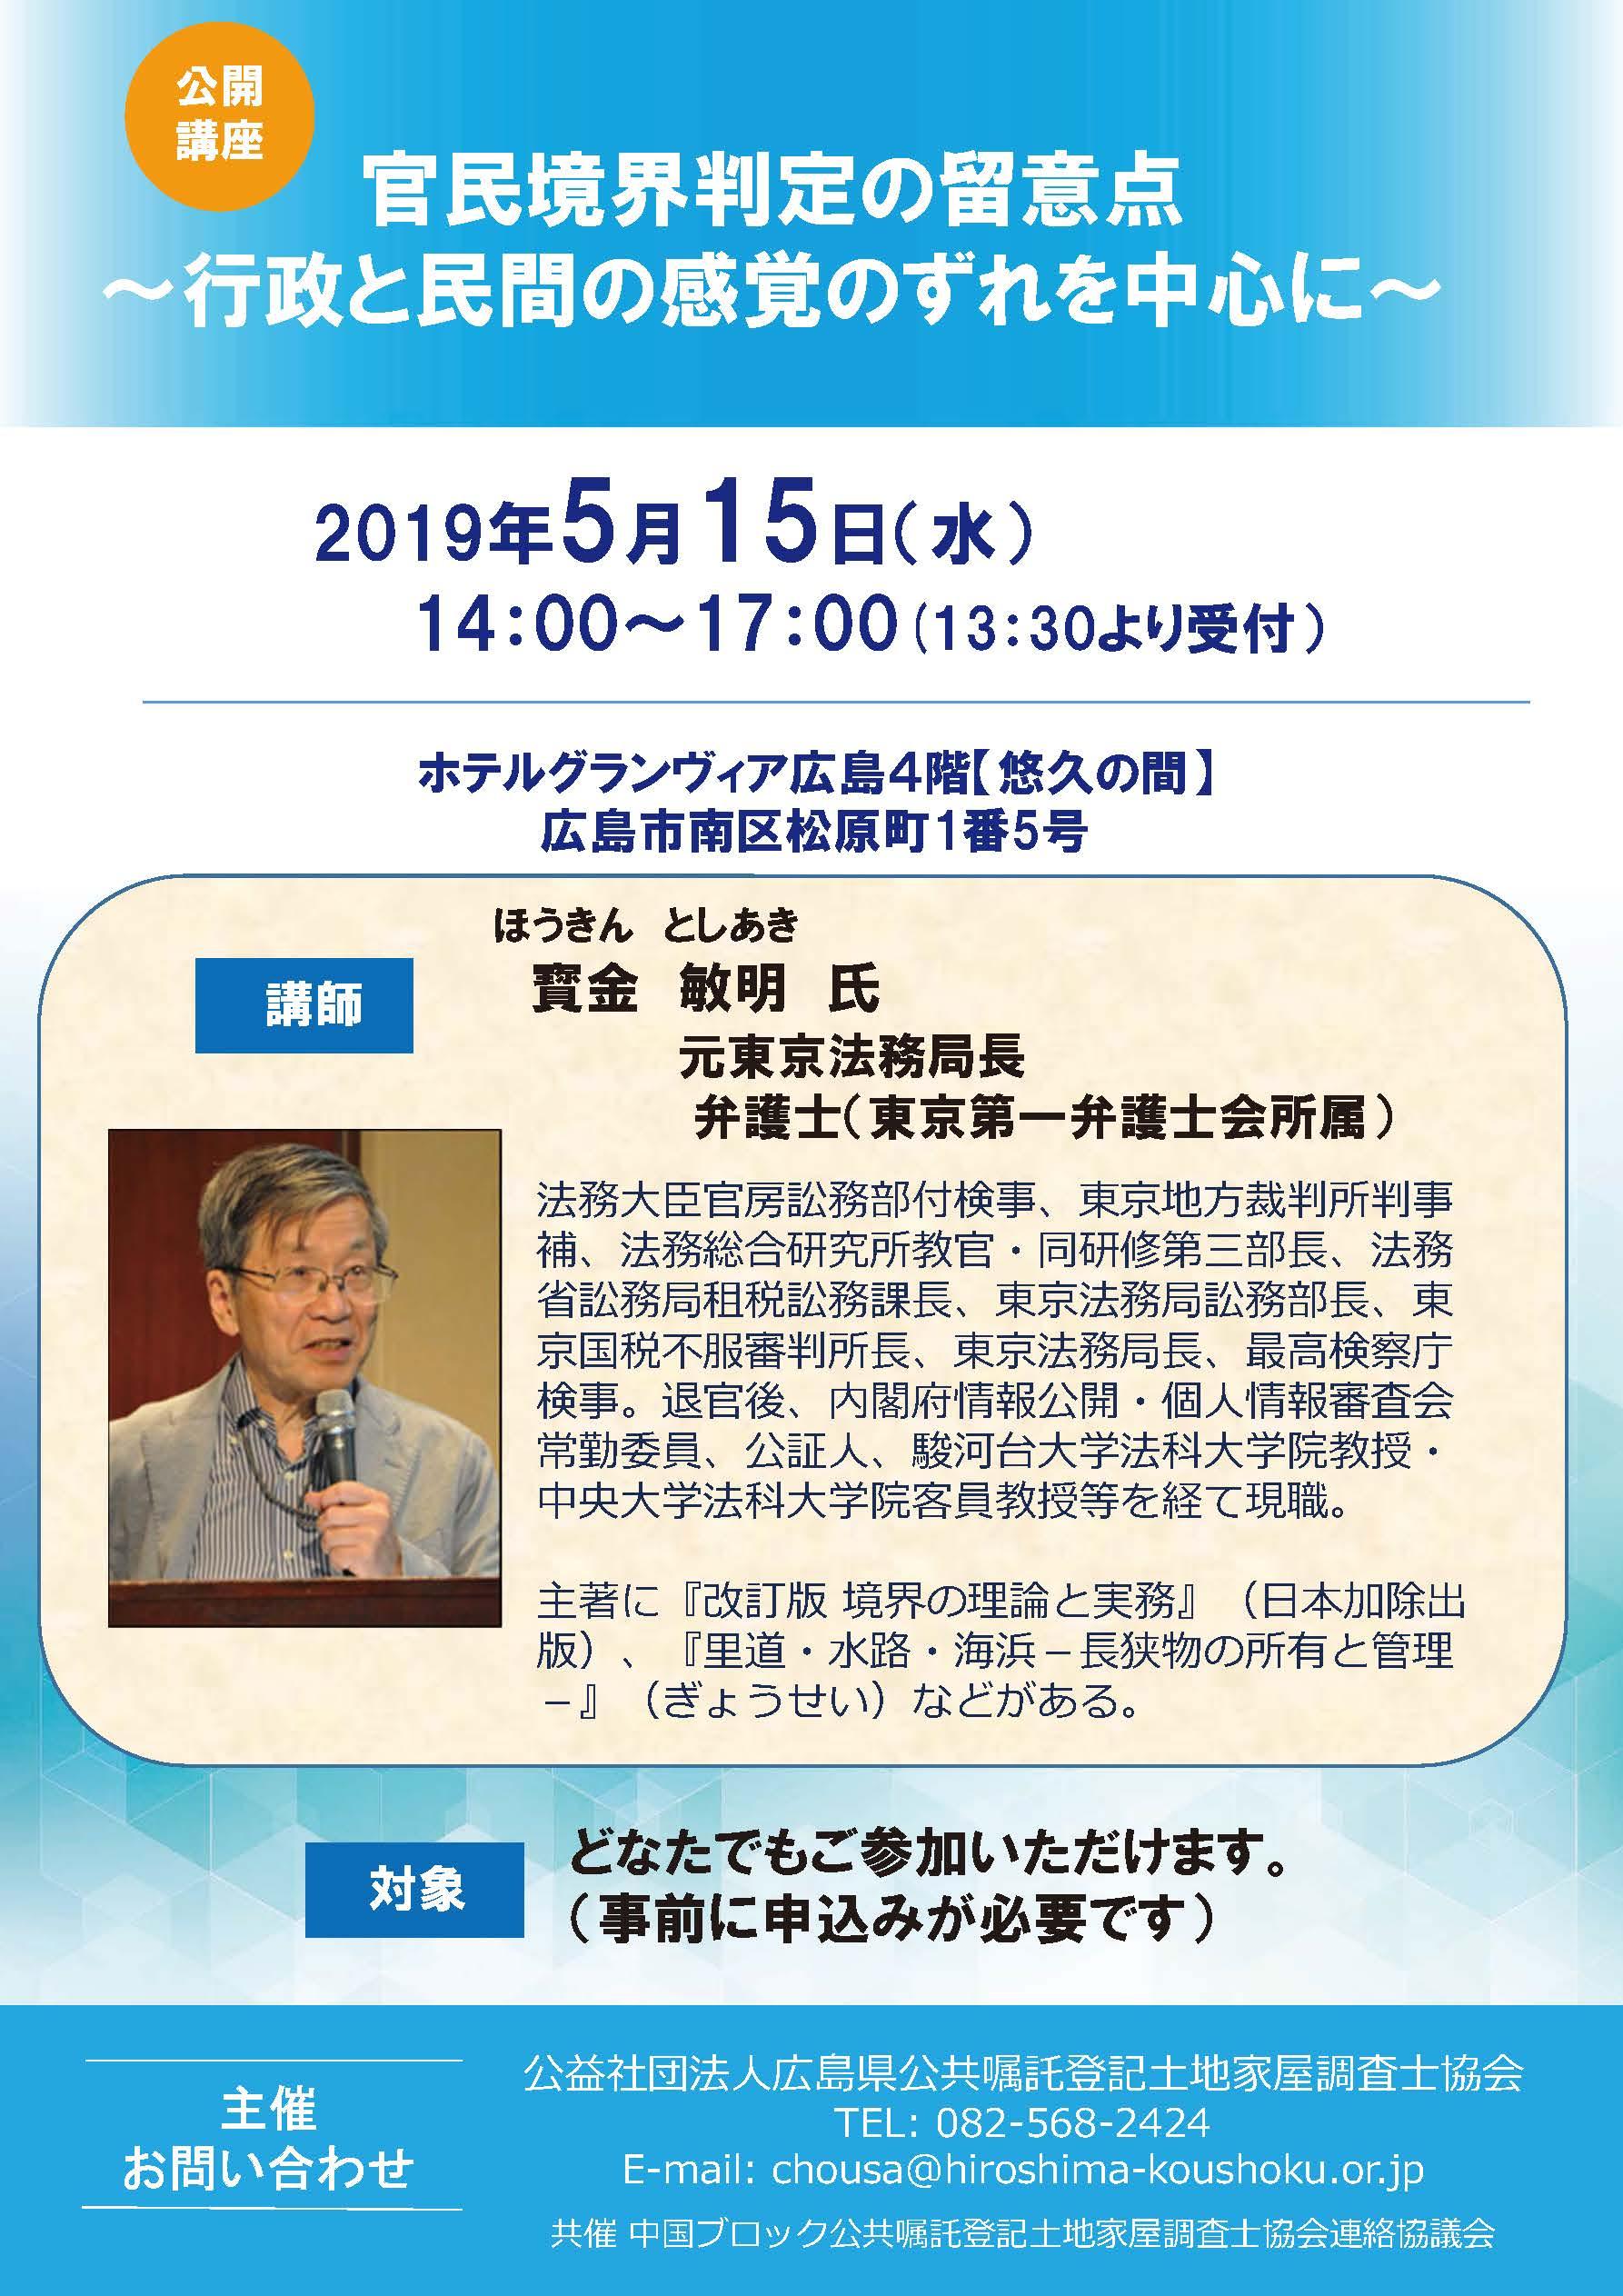 43 HPチラシ【開催案内(関係各位)】20190515講演会